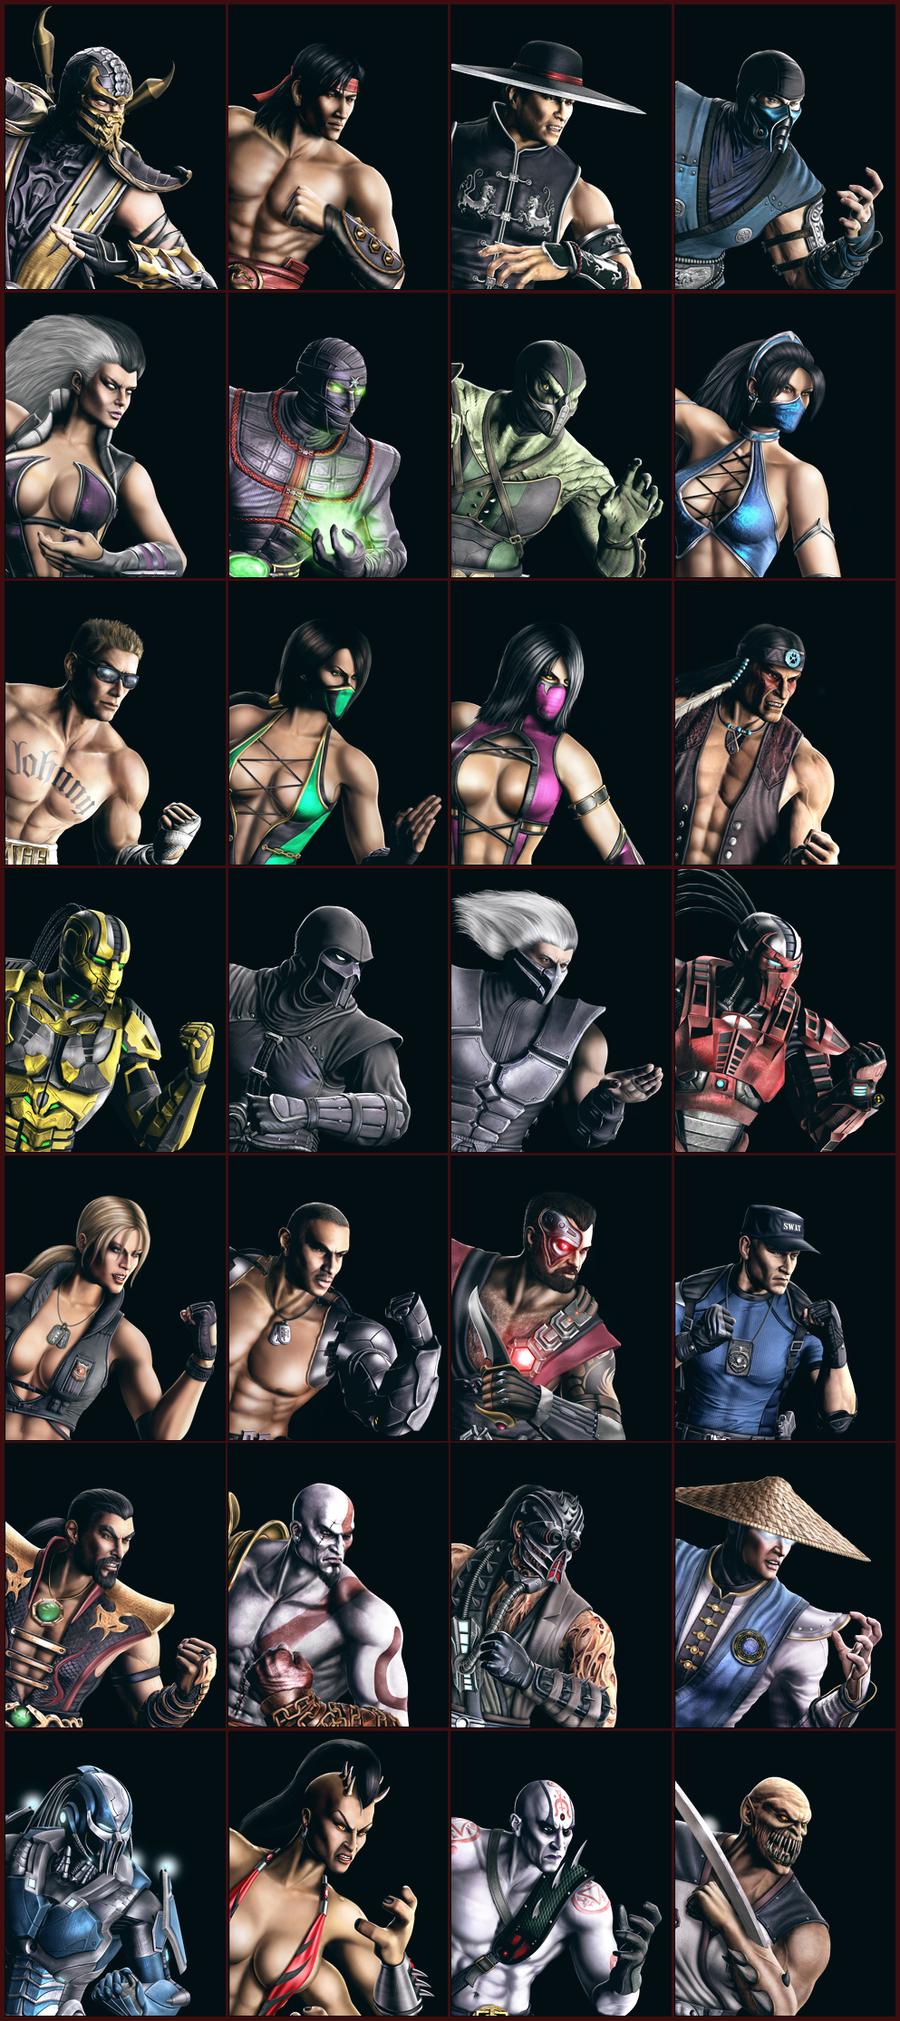 Mortal Kombat 9 Komplete Edition - Mileena Victory Pose